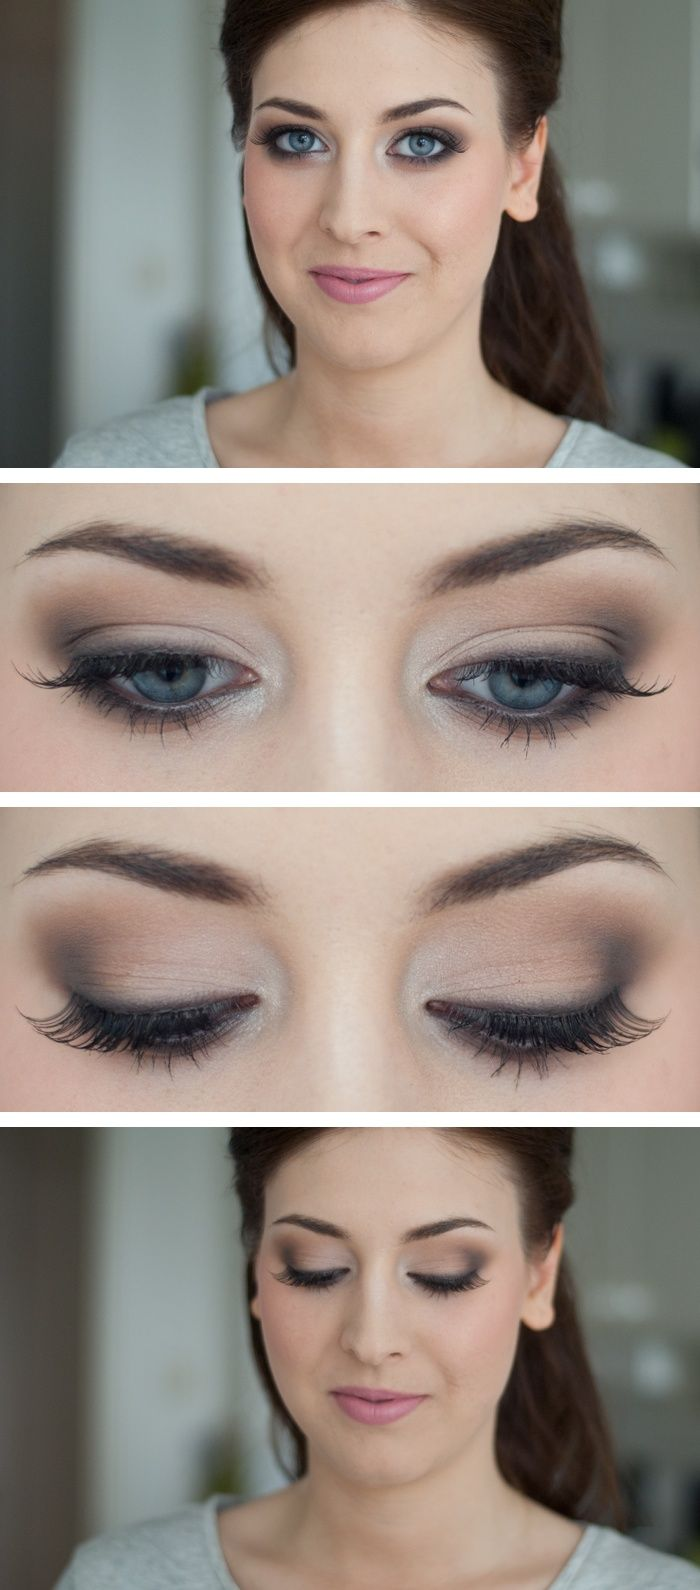 natural, eye makeup, lashes, eye shadow, blue eyes- very similar looking to